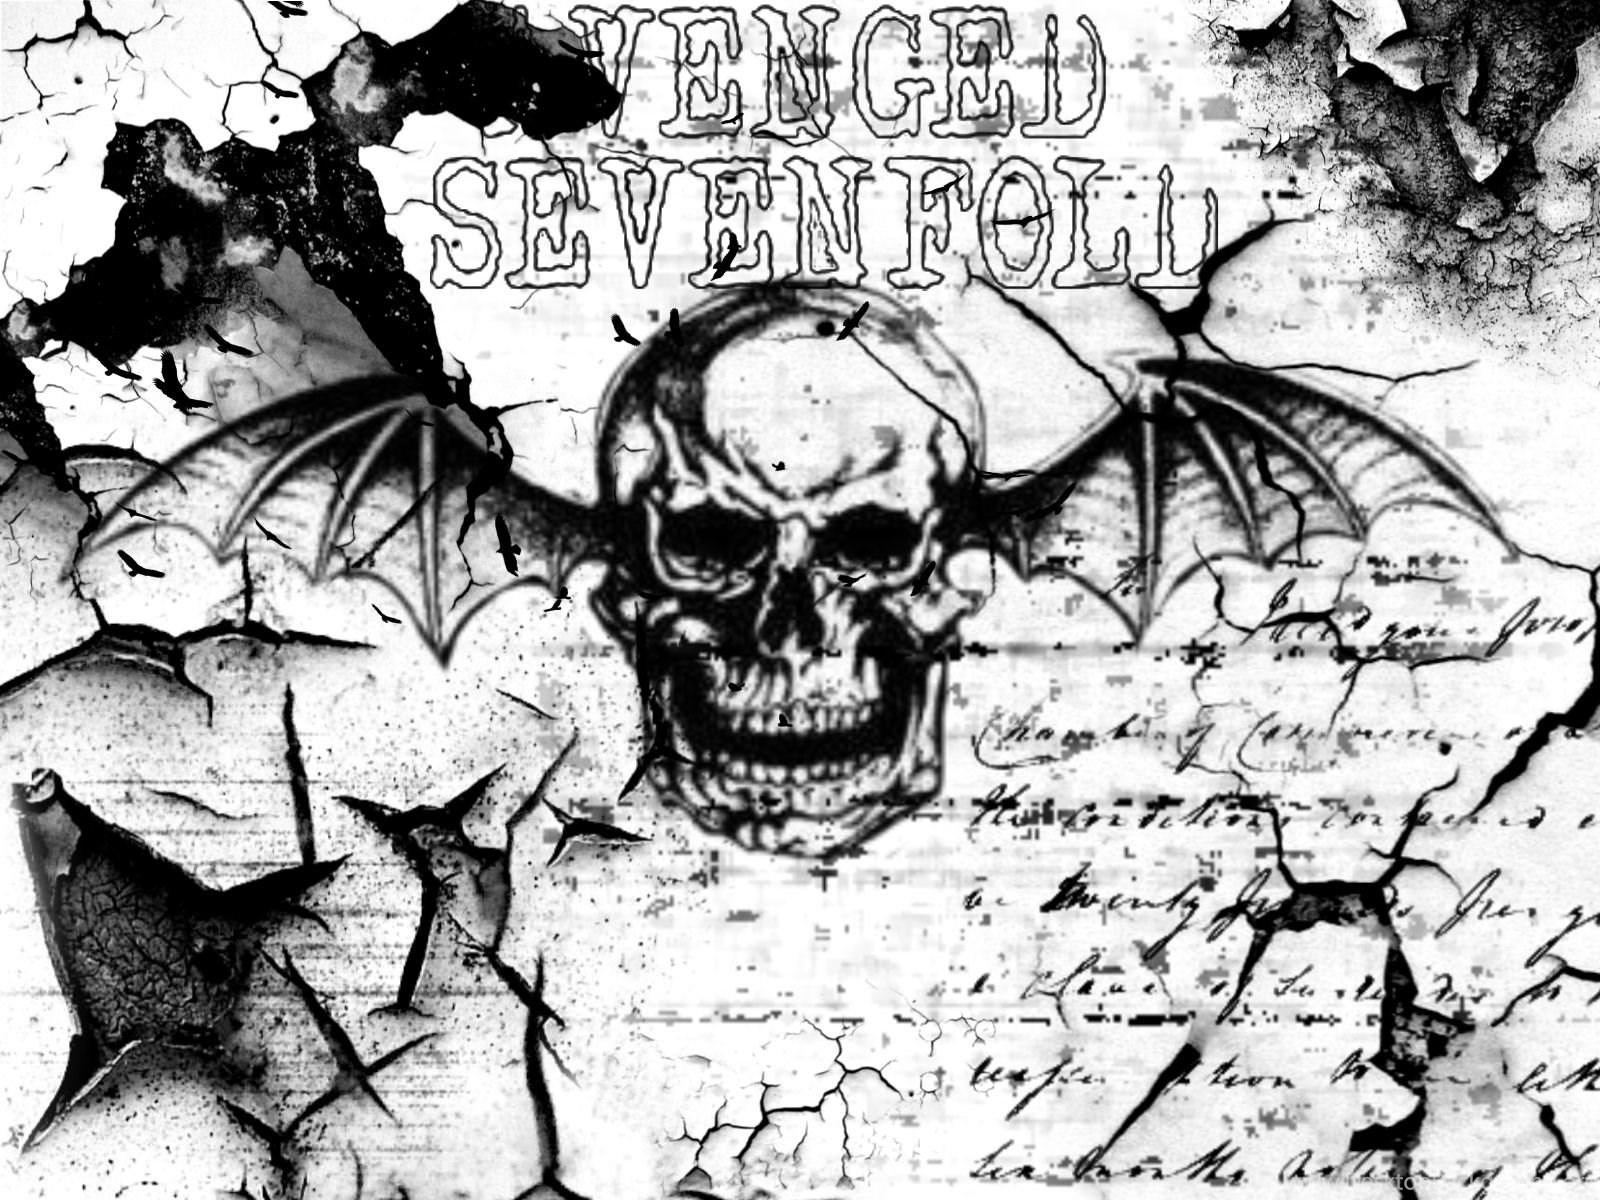 Avenged Sevenfold Deathbat Wallpapers Free 2kb Wallpey Desktop